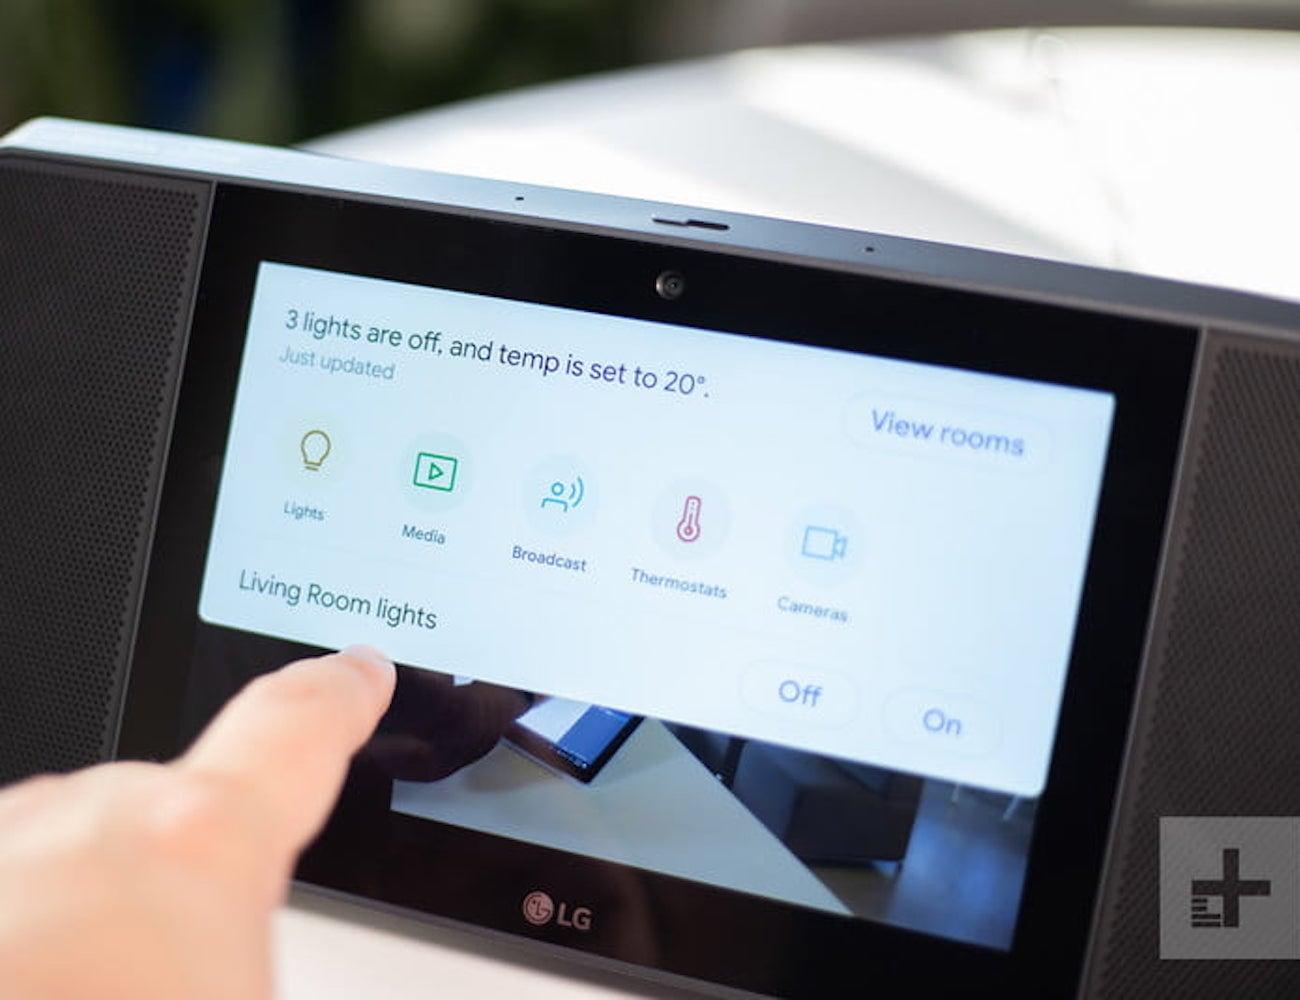 LG XBOOM AI ThinQ WK9 Smart Display Speaker